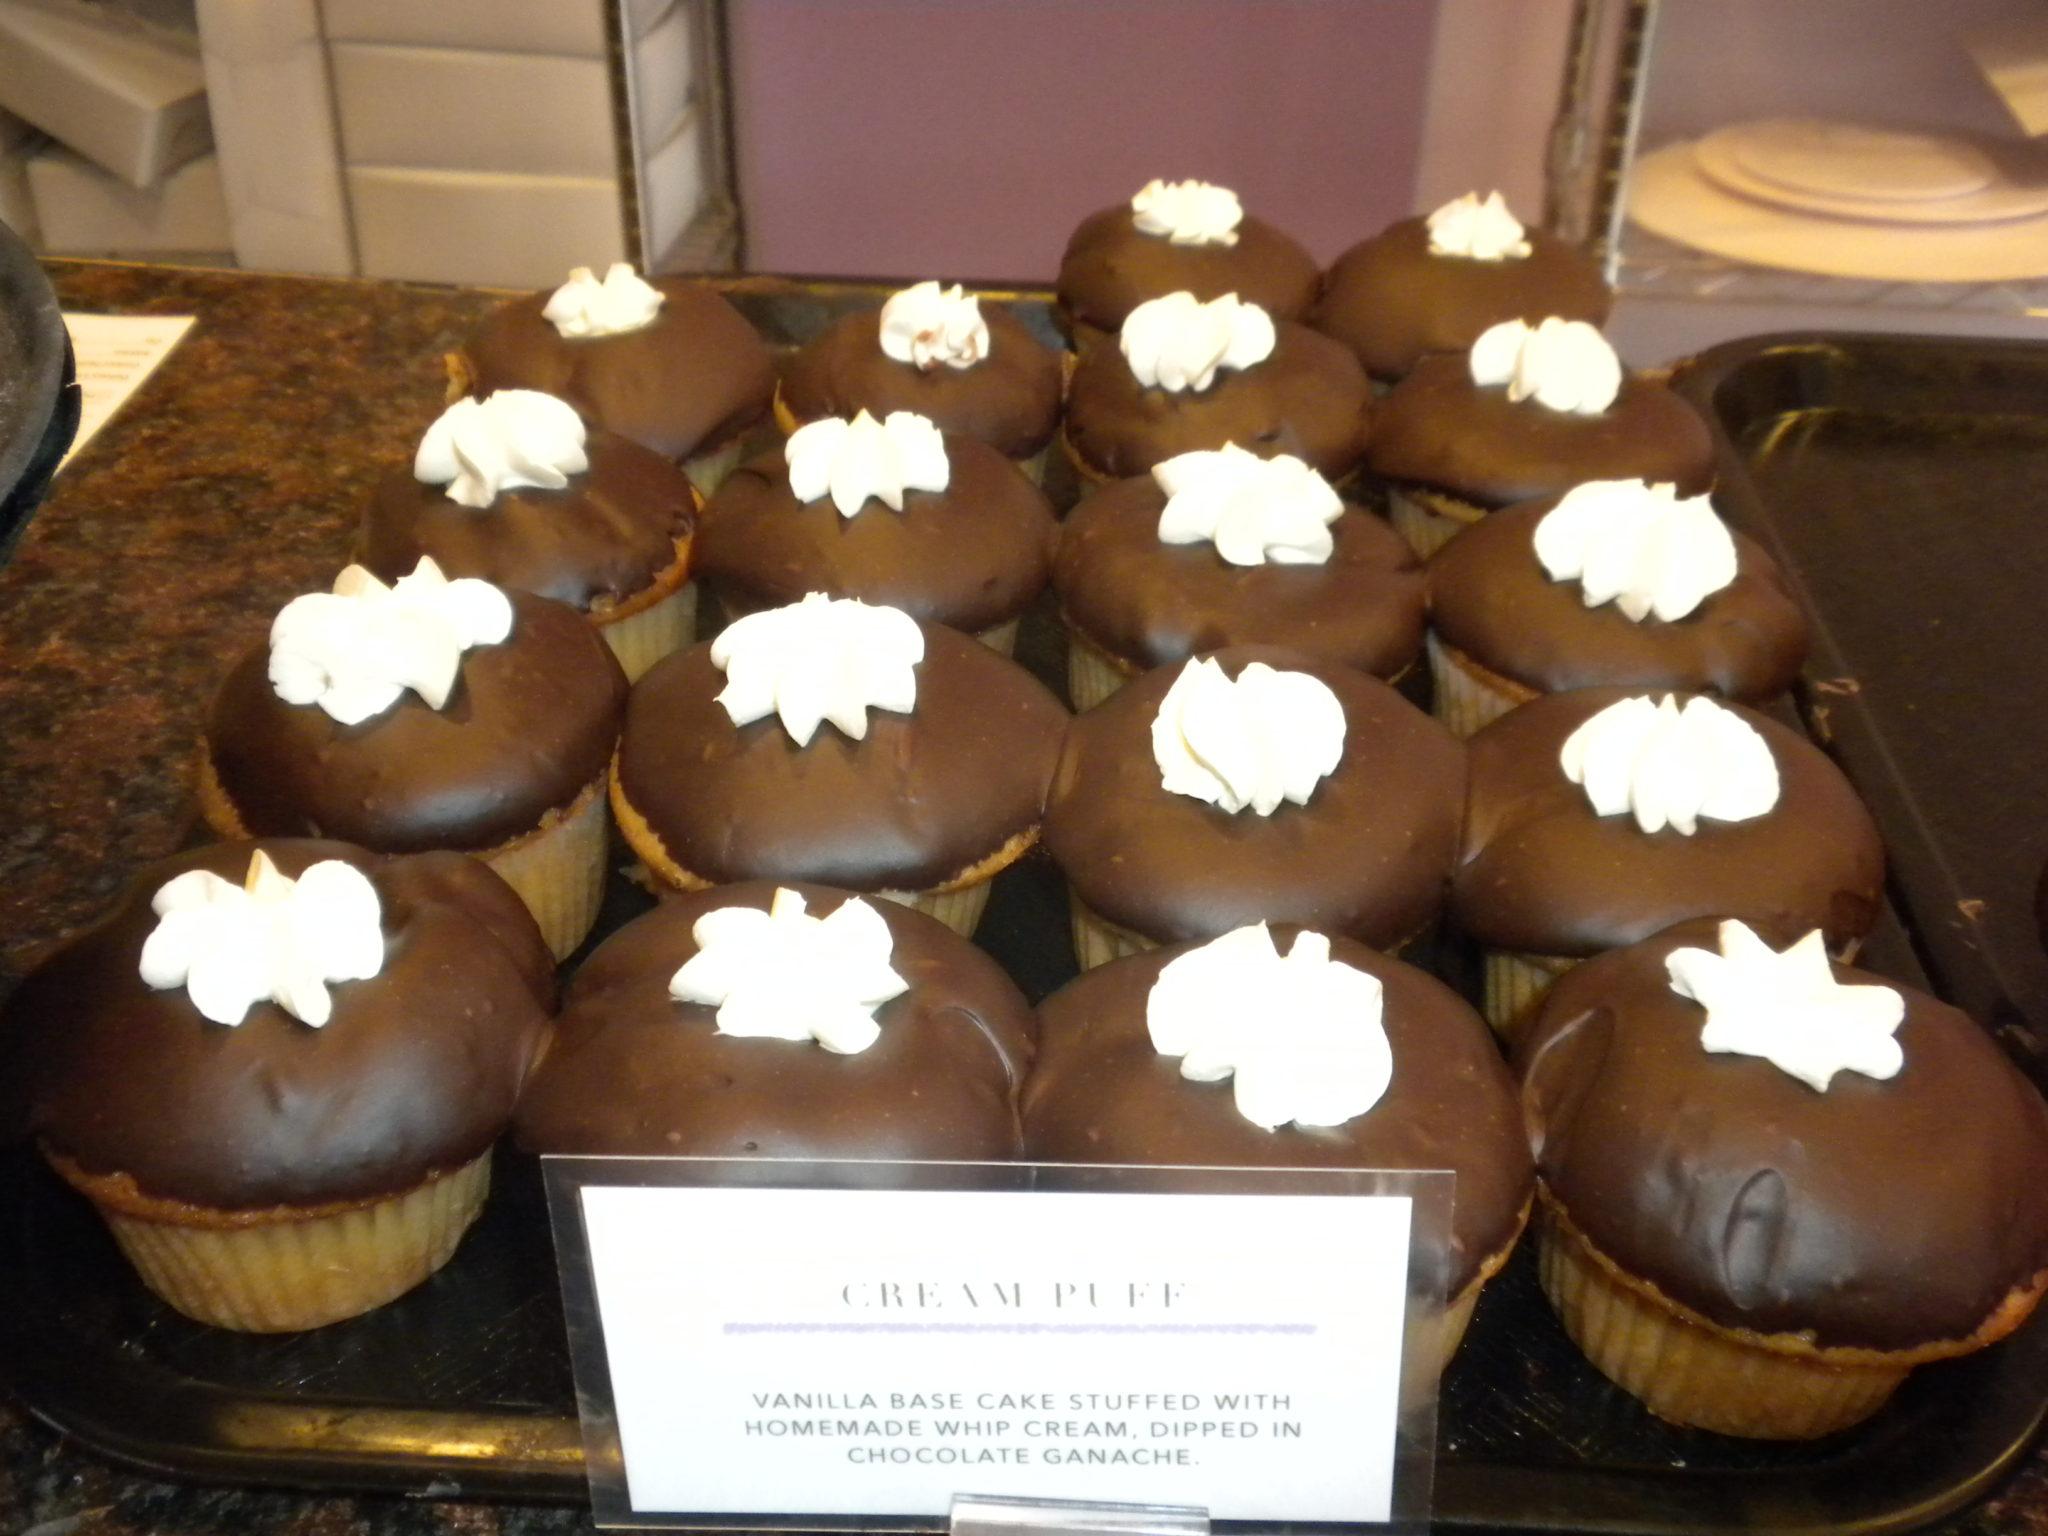 Cream Puff Cupcakes At Cupcake Magician Photo By Susan Ericson Click To Enlarge